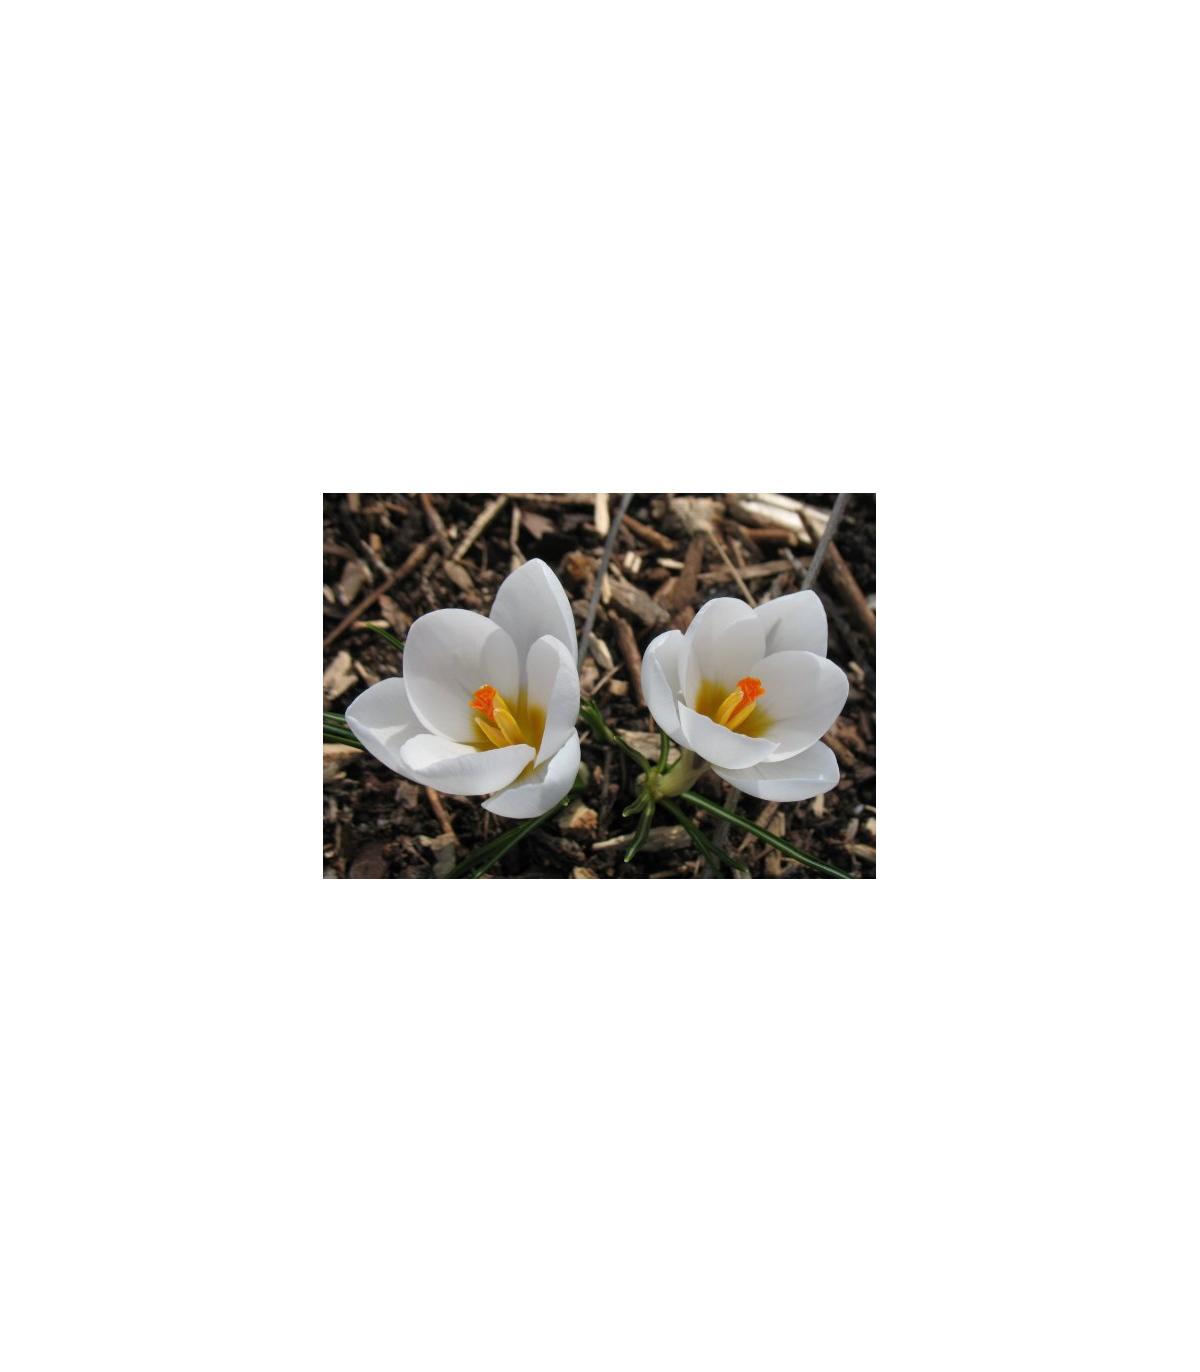 Krókus Miss Vain - Crocus biflorus - predaj cibuľovín - 3 ks